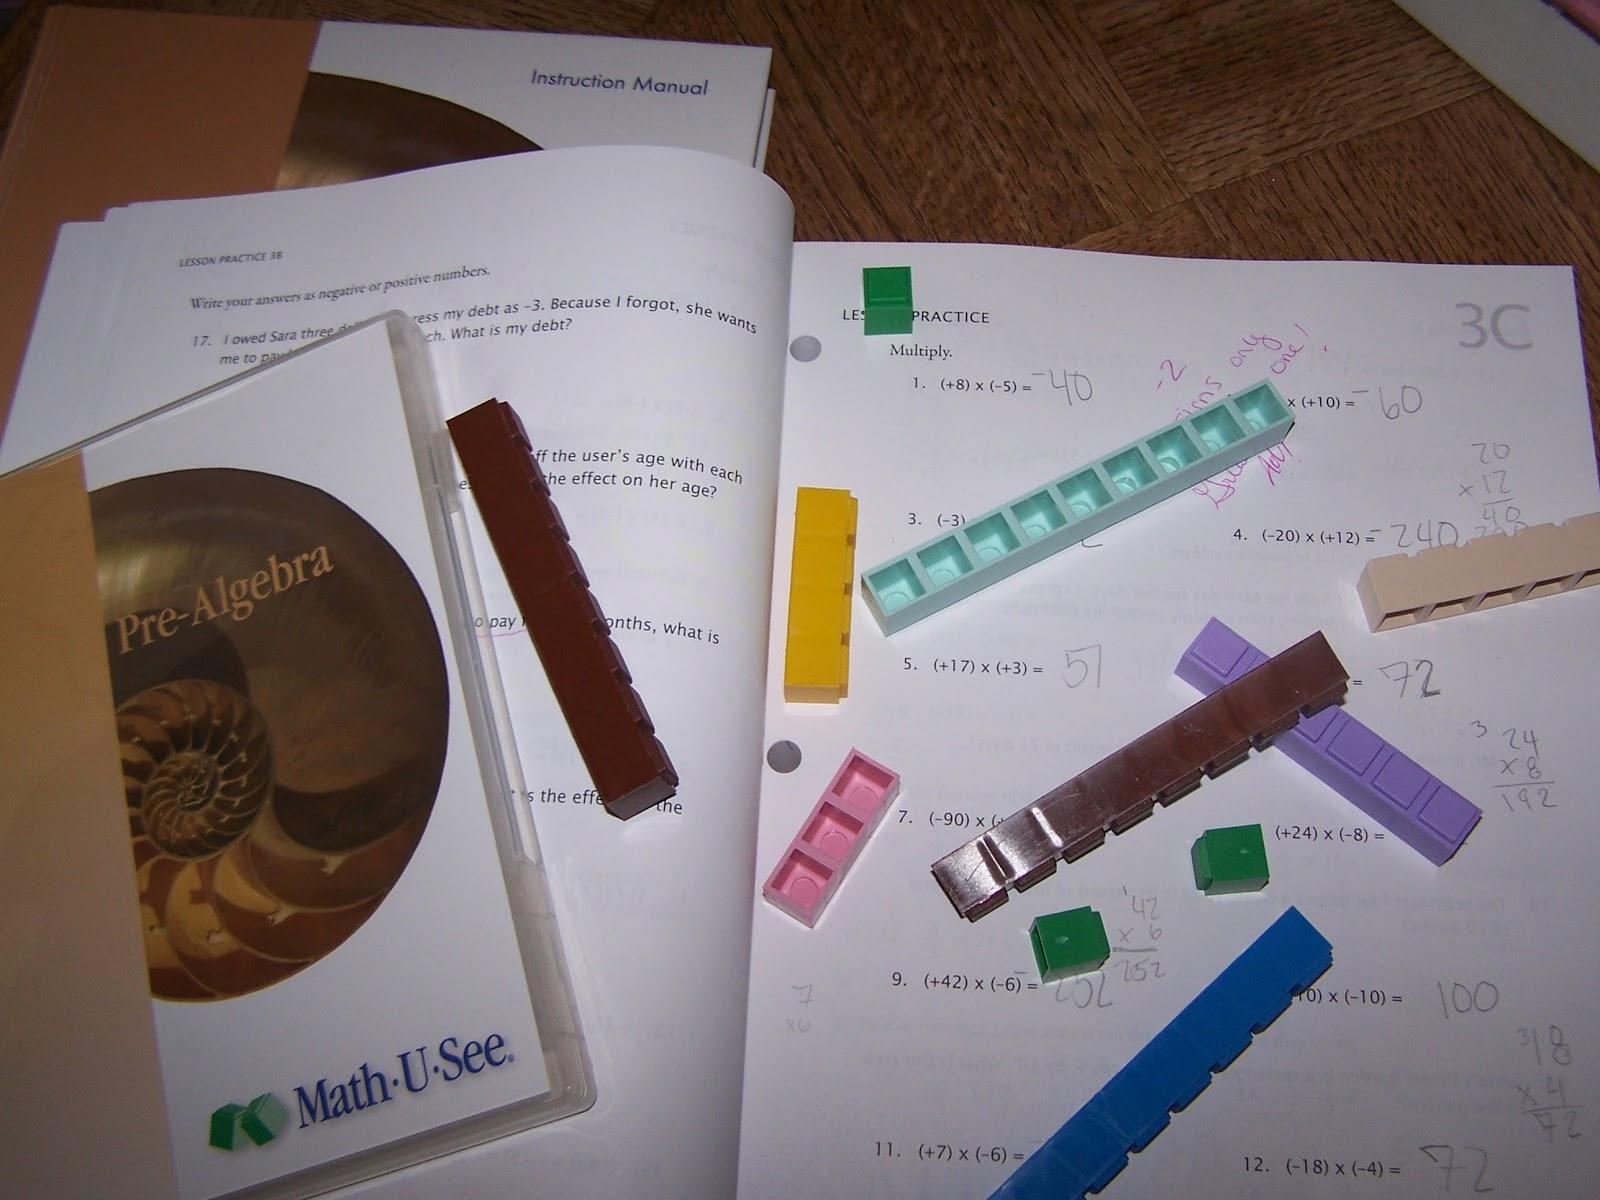 math worksheet : math u see pre algebra worksheets  educational math activities : Math U See Worksheet